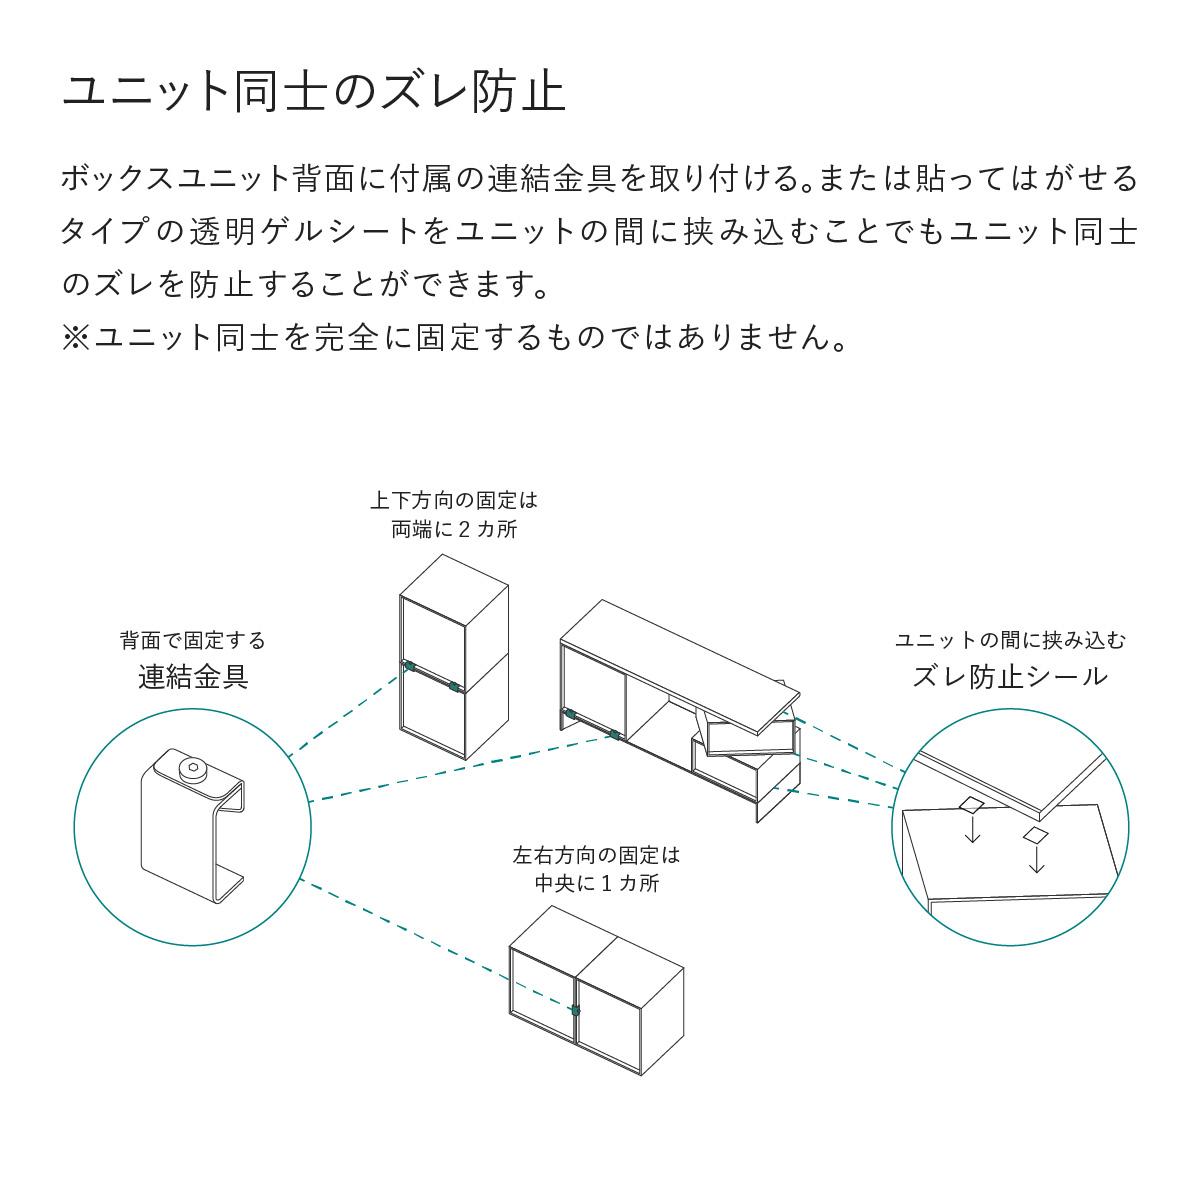 【V-TISS LIGHT  Set Plan-A】 スクエアとハーフのボックスユニットによる、組み合わせ自由度の高い収納